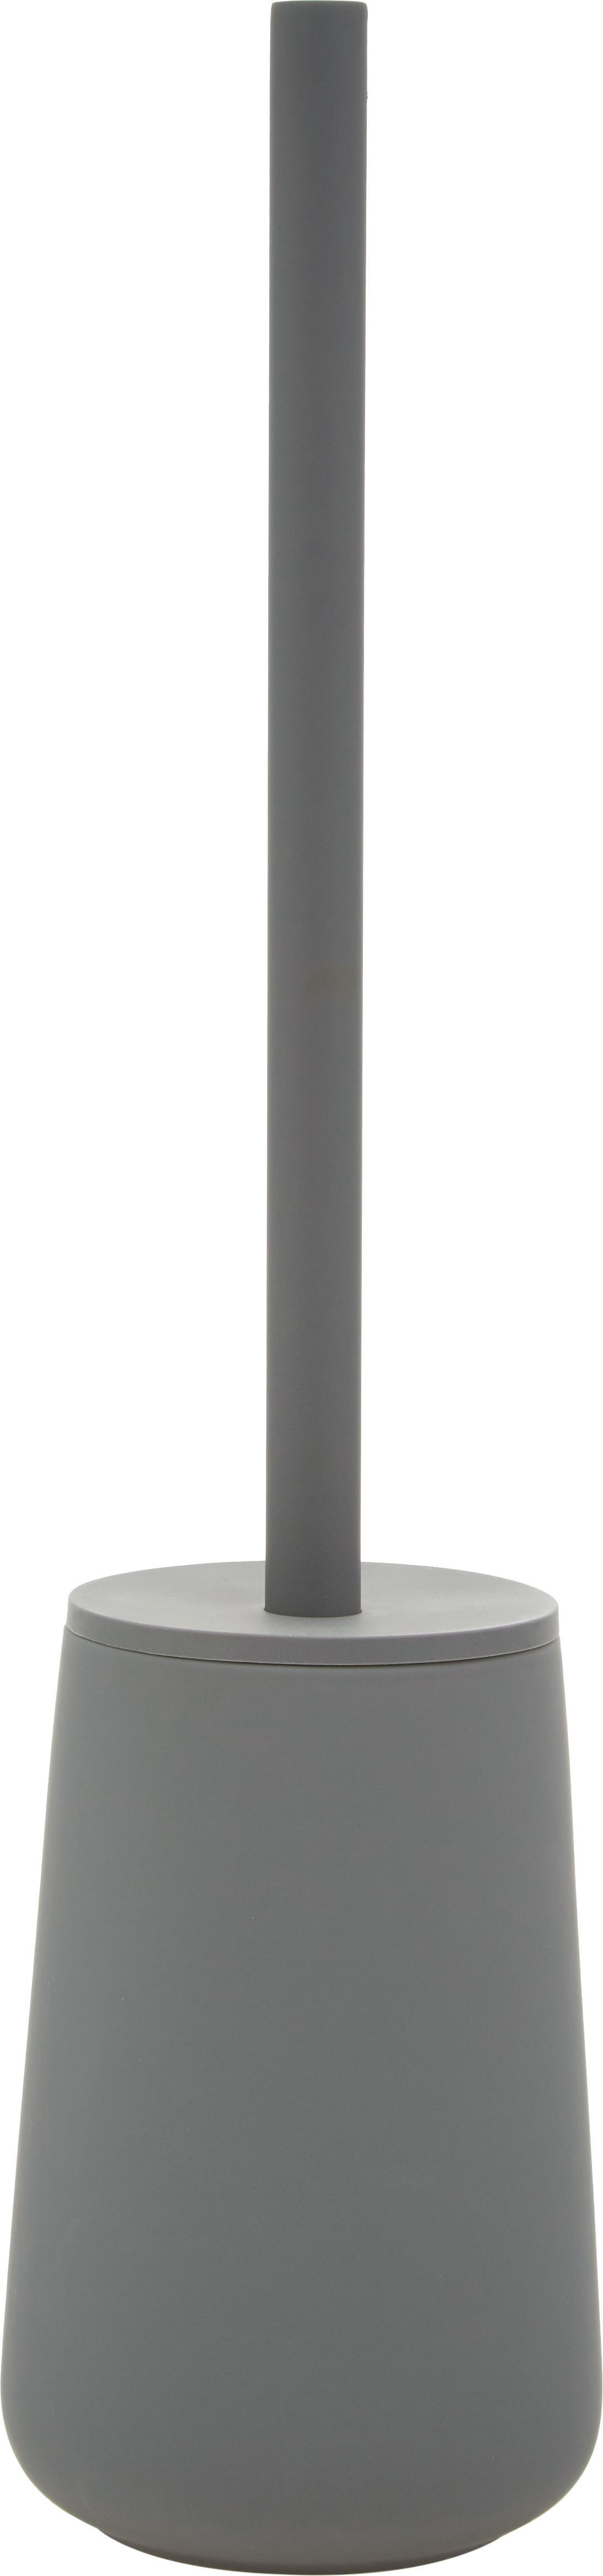 Toiletborstel Brush, Grijs, mat, Ø 10 x H 37 cm